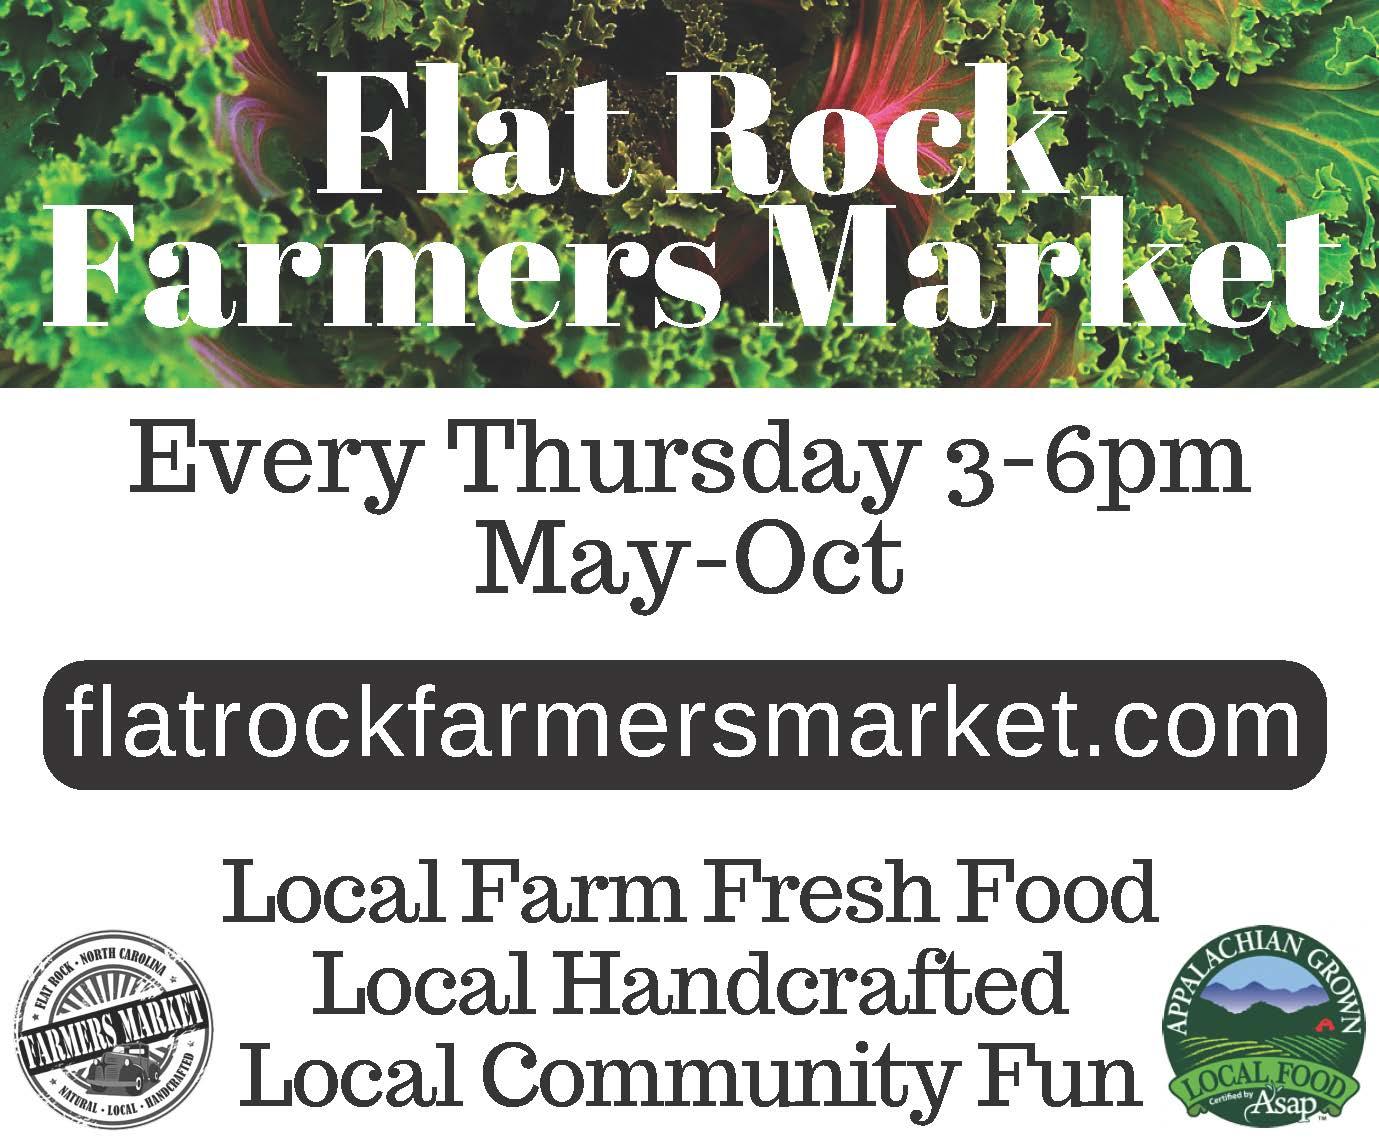 http://www.flatrockfarmersmarket.com